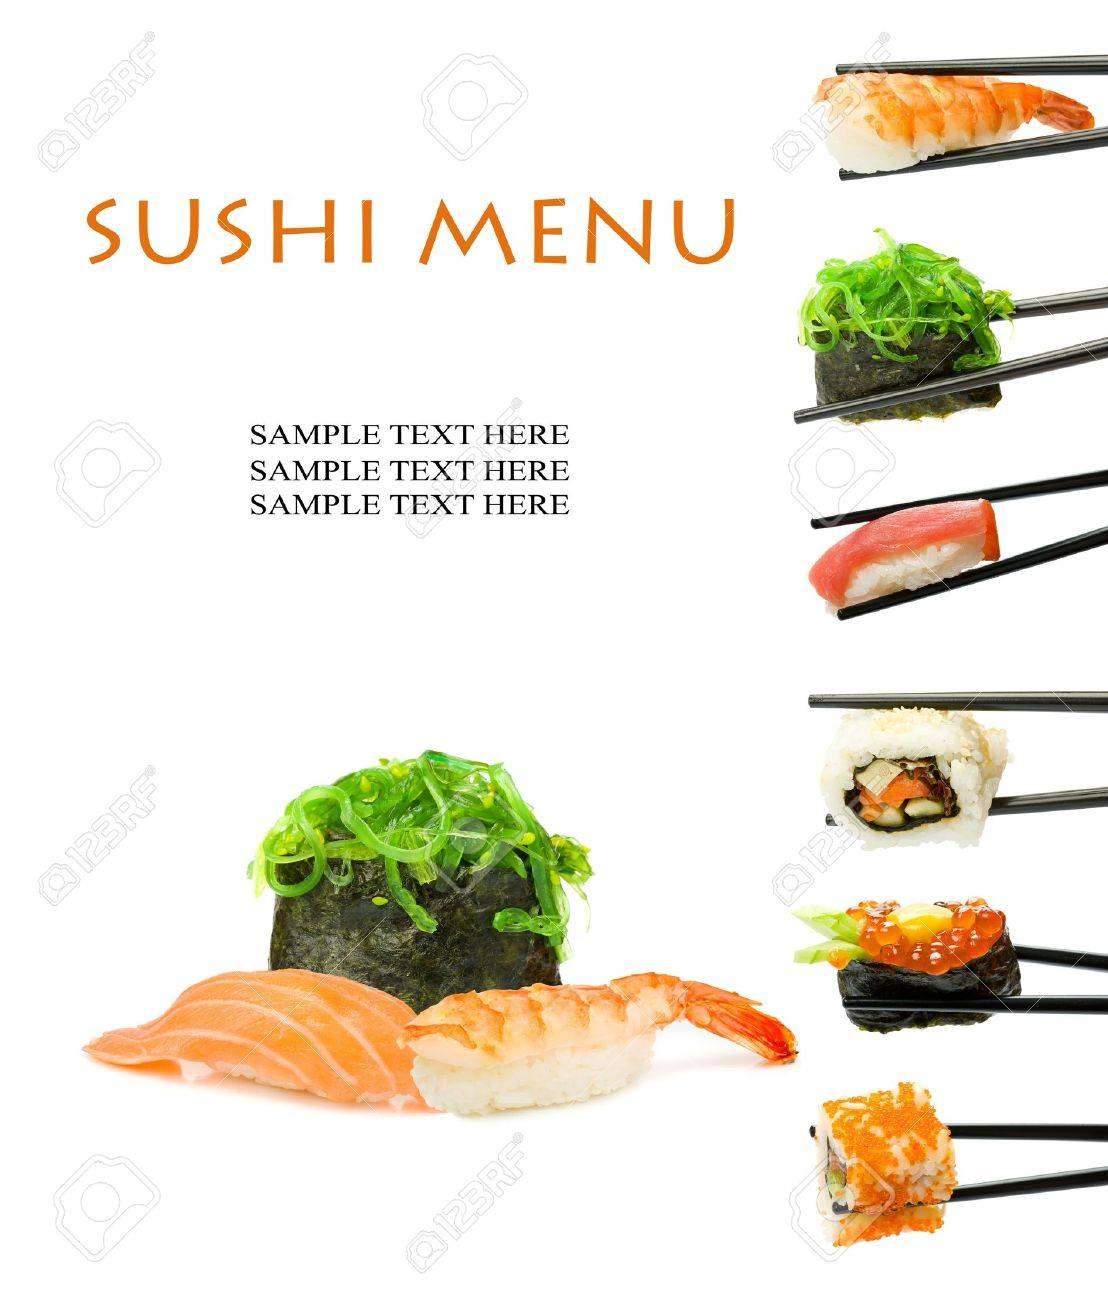 Sushi menu Stock Photo - 10627072